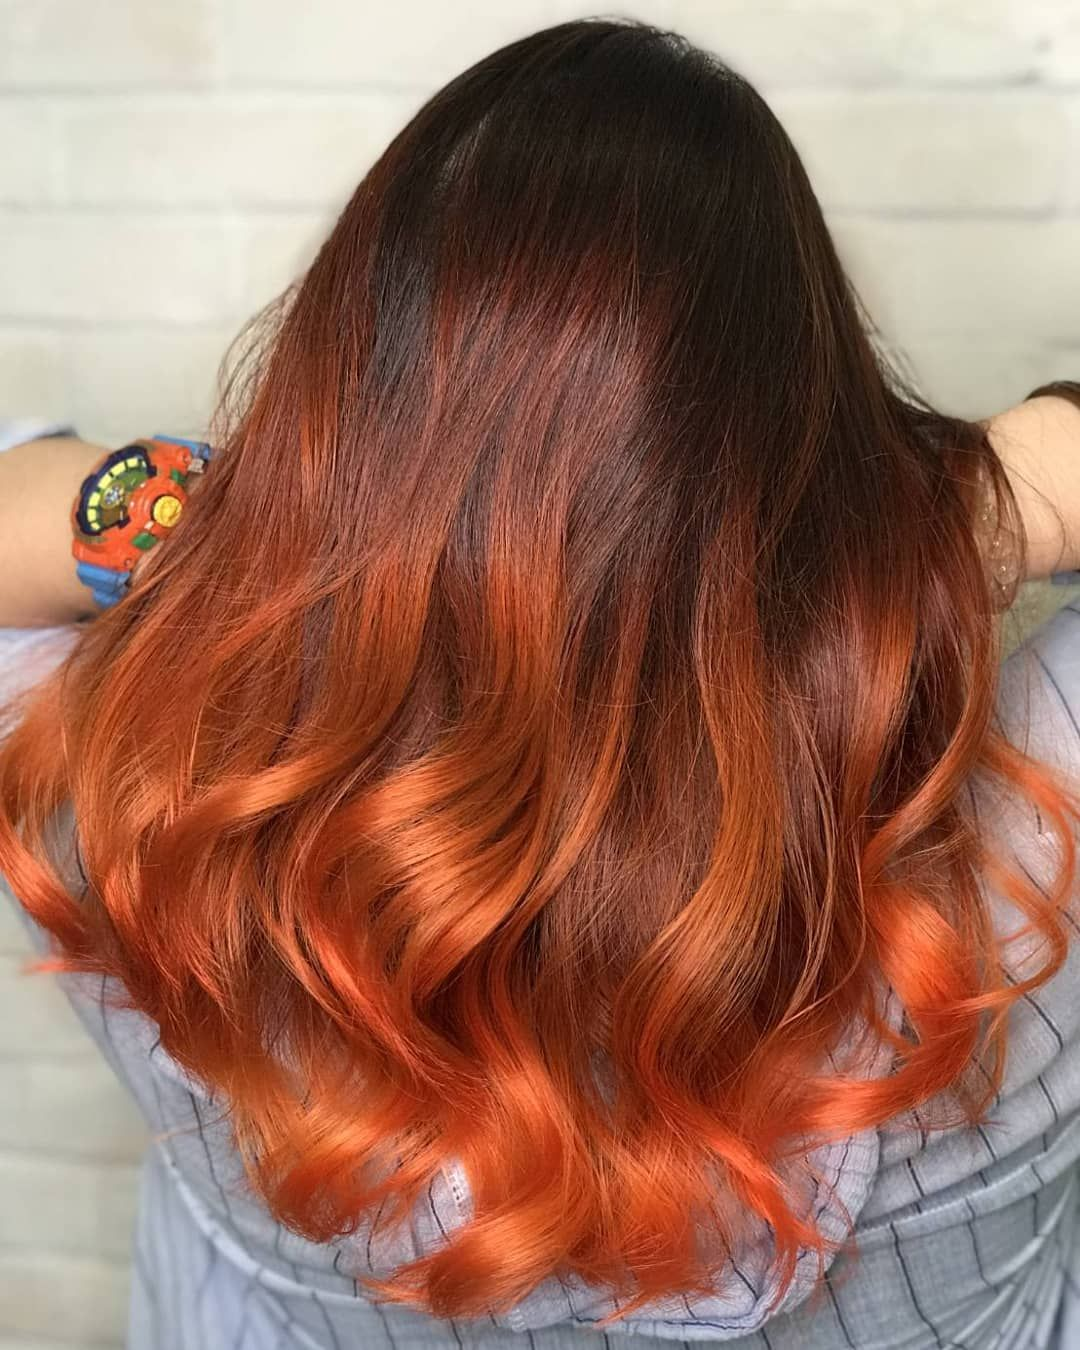 The Ultimate Hair Makeover! Ginger Spark : Definitely not for the